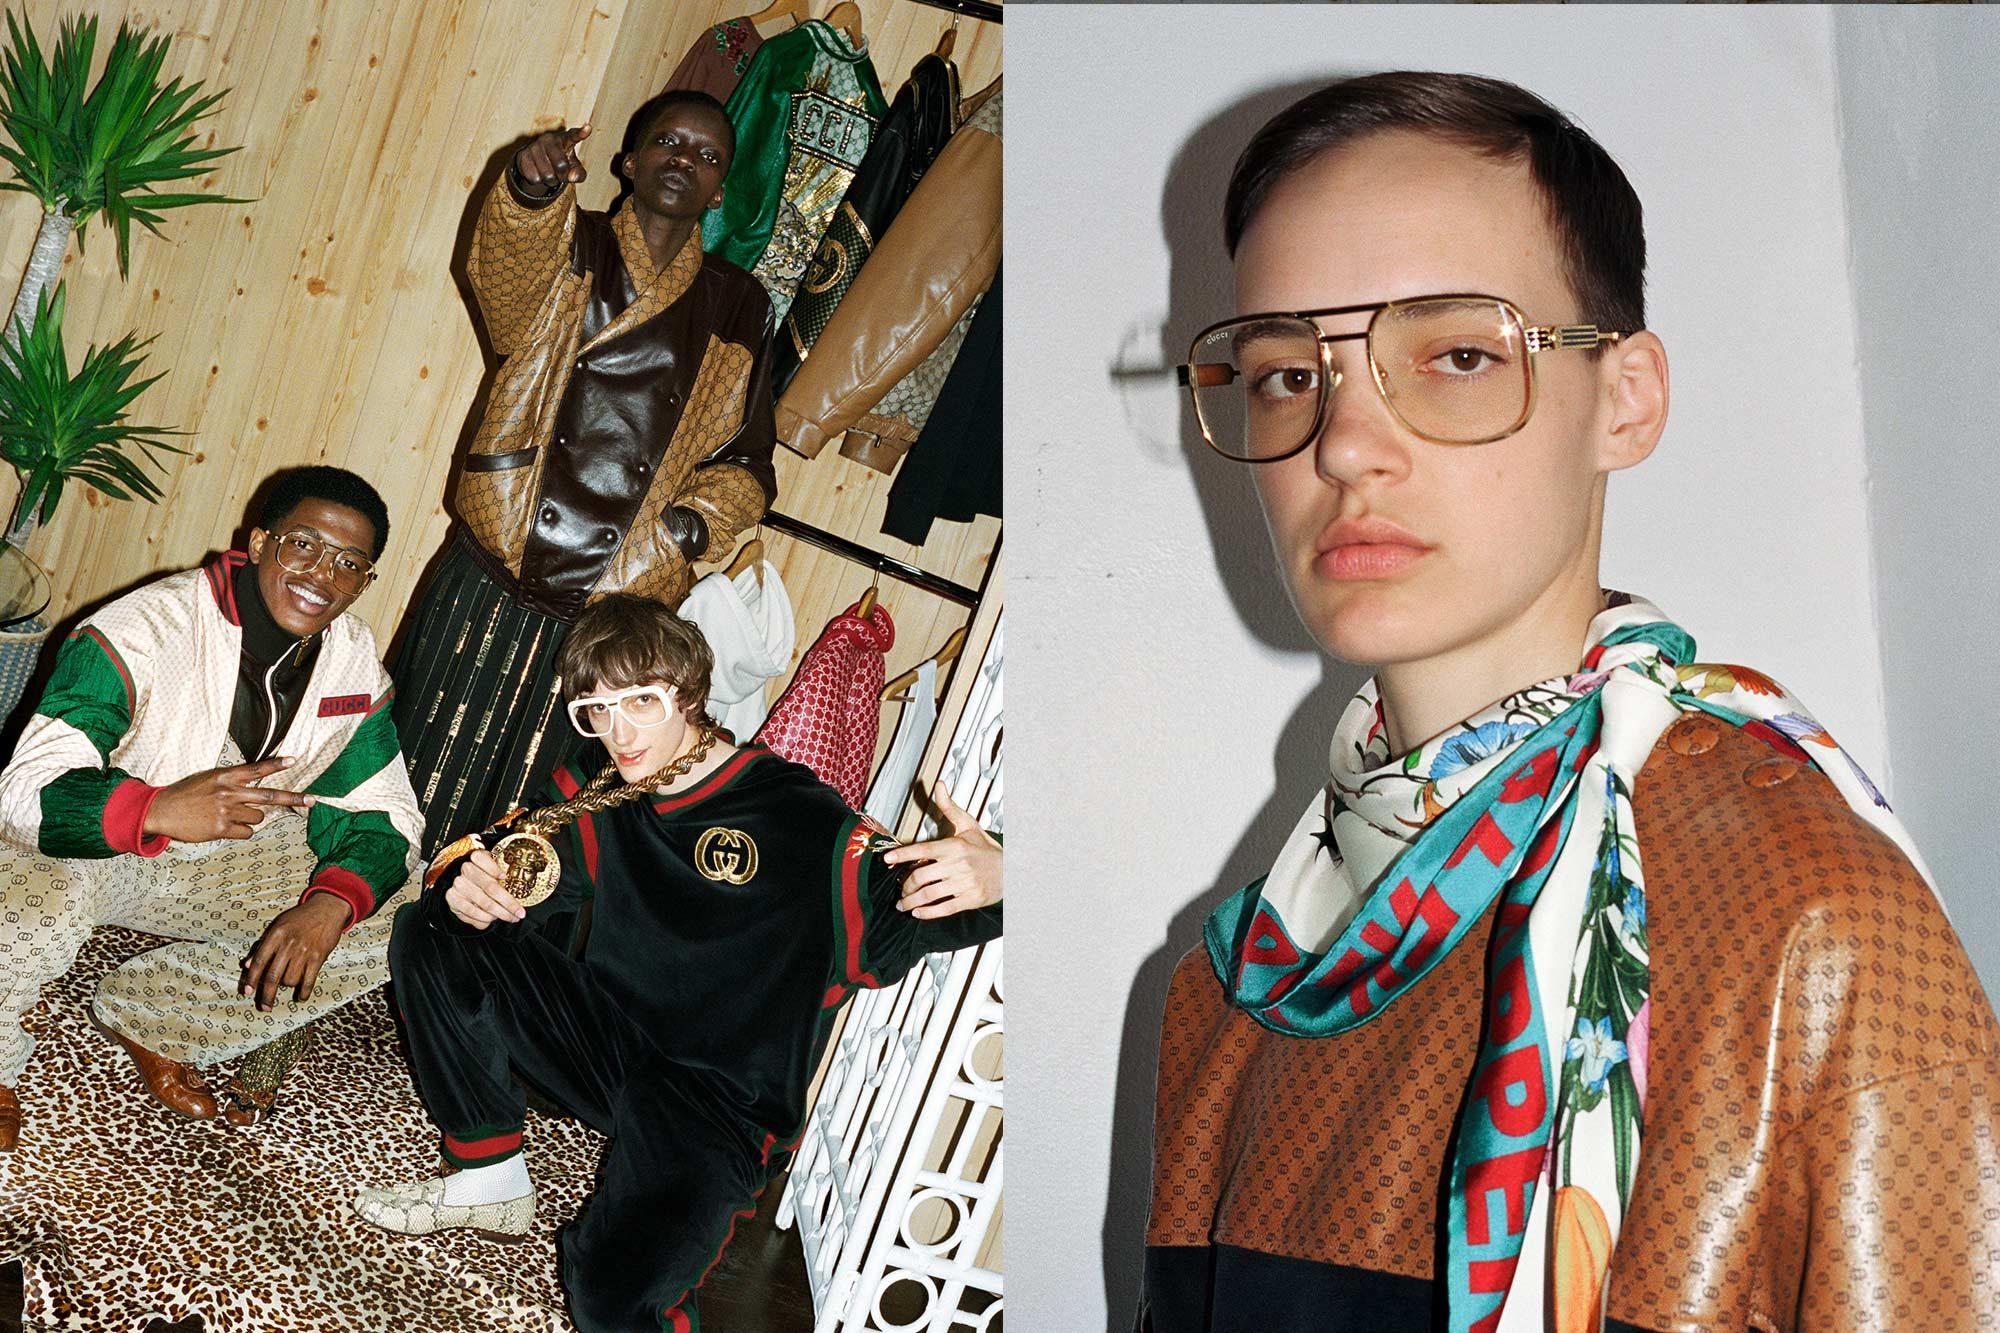 303ae77637 You Can Now Cop the Gucci-Dapper Dan Collection Online 重現 80 年代街頭美學 Dapper  Dan 與 Gucci 展開聯名合作 – KEEDAN.